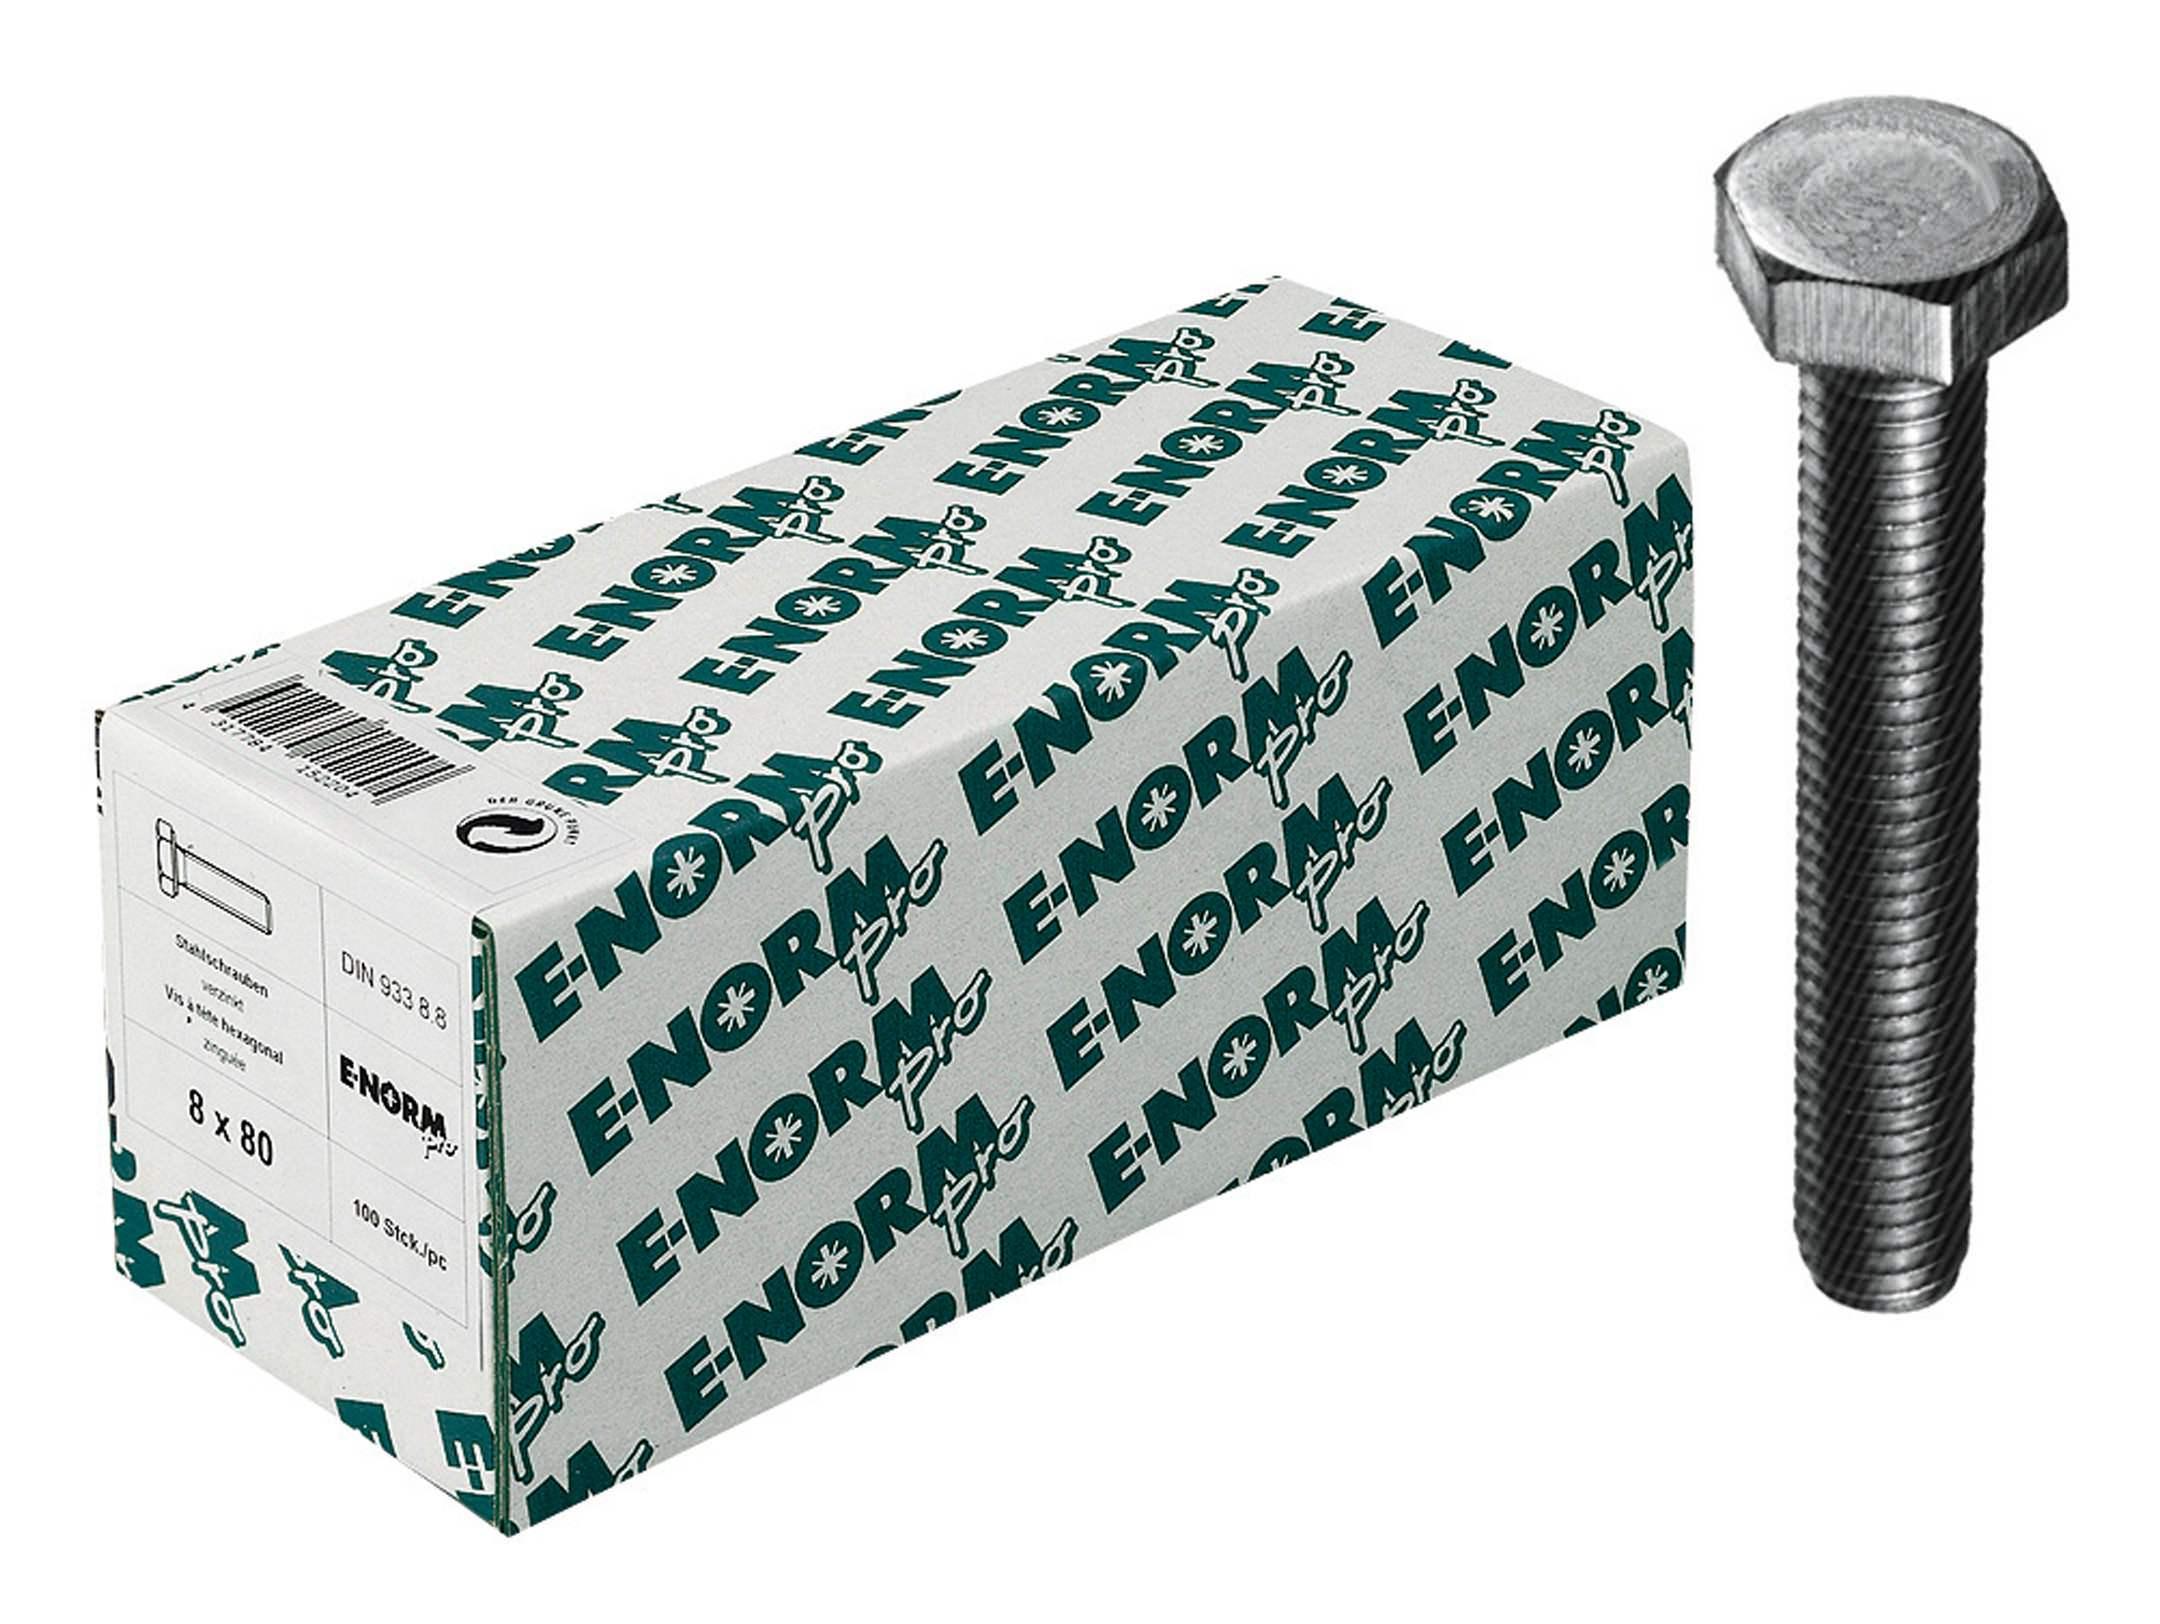 Format Möbelgiffschraube M 4 x 32 mm Pack 100 Stück